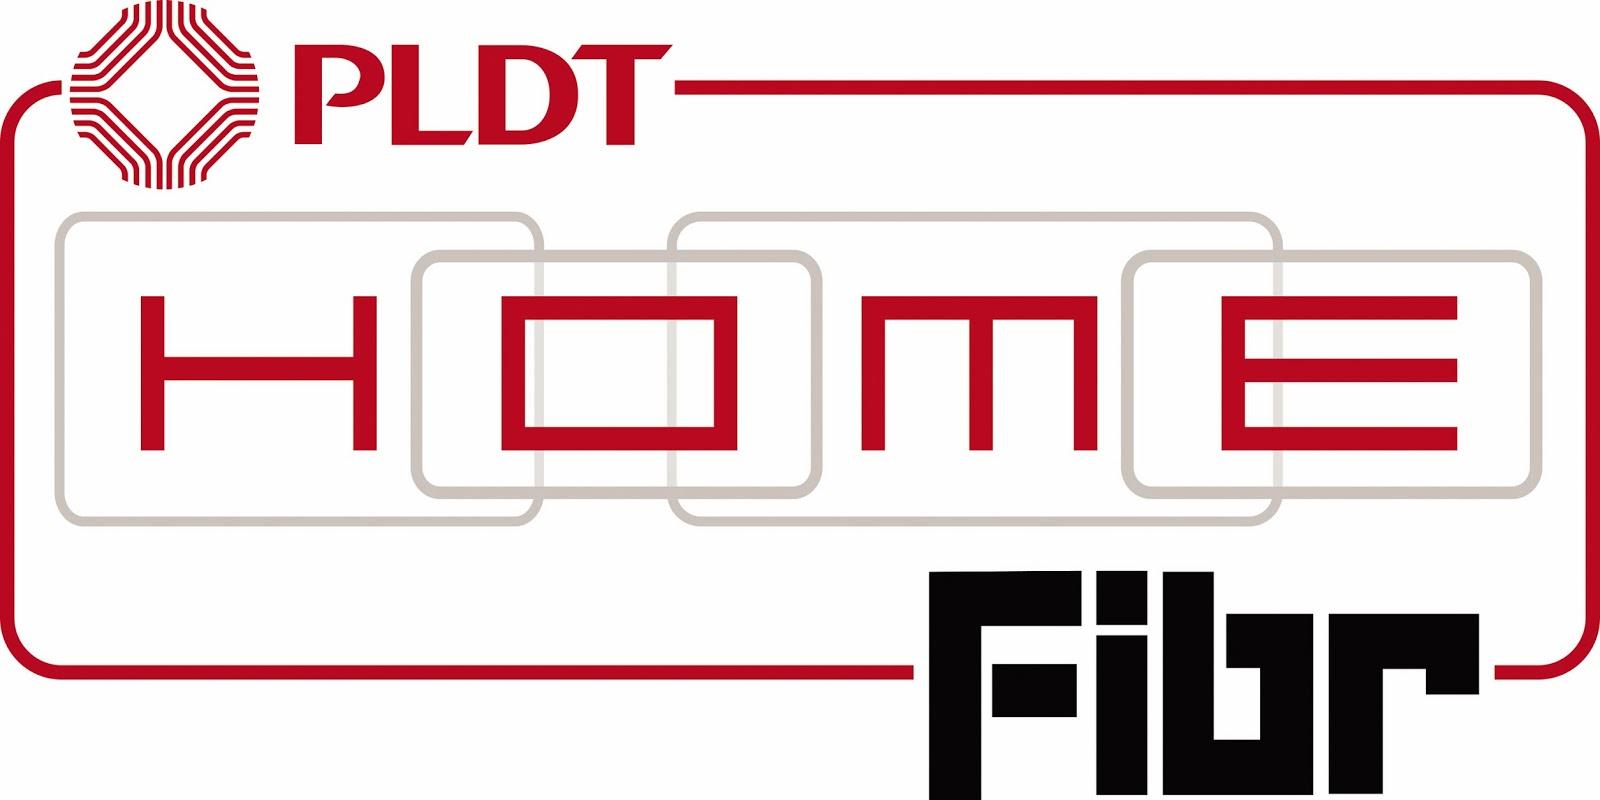 Should I be mad at PLDT FIBR?